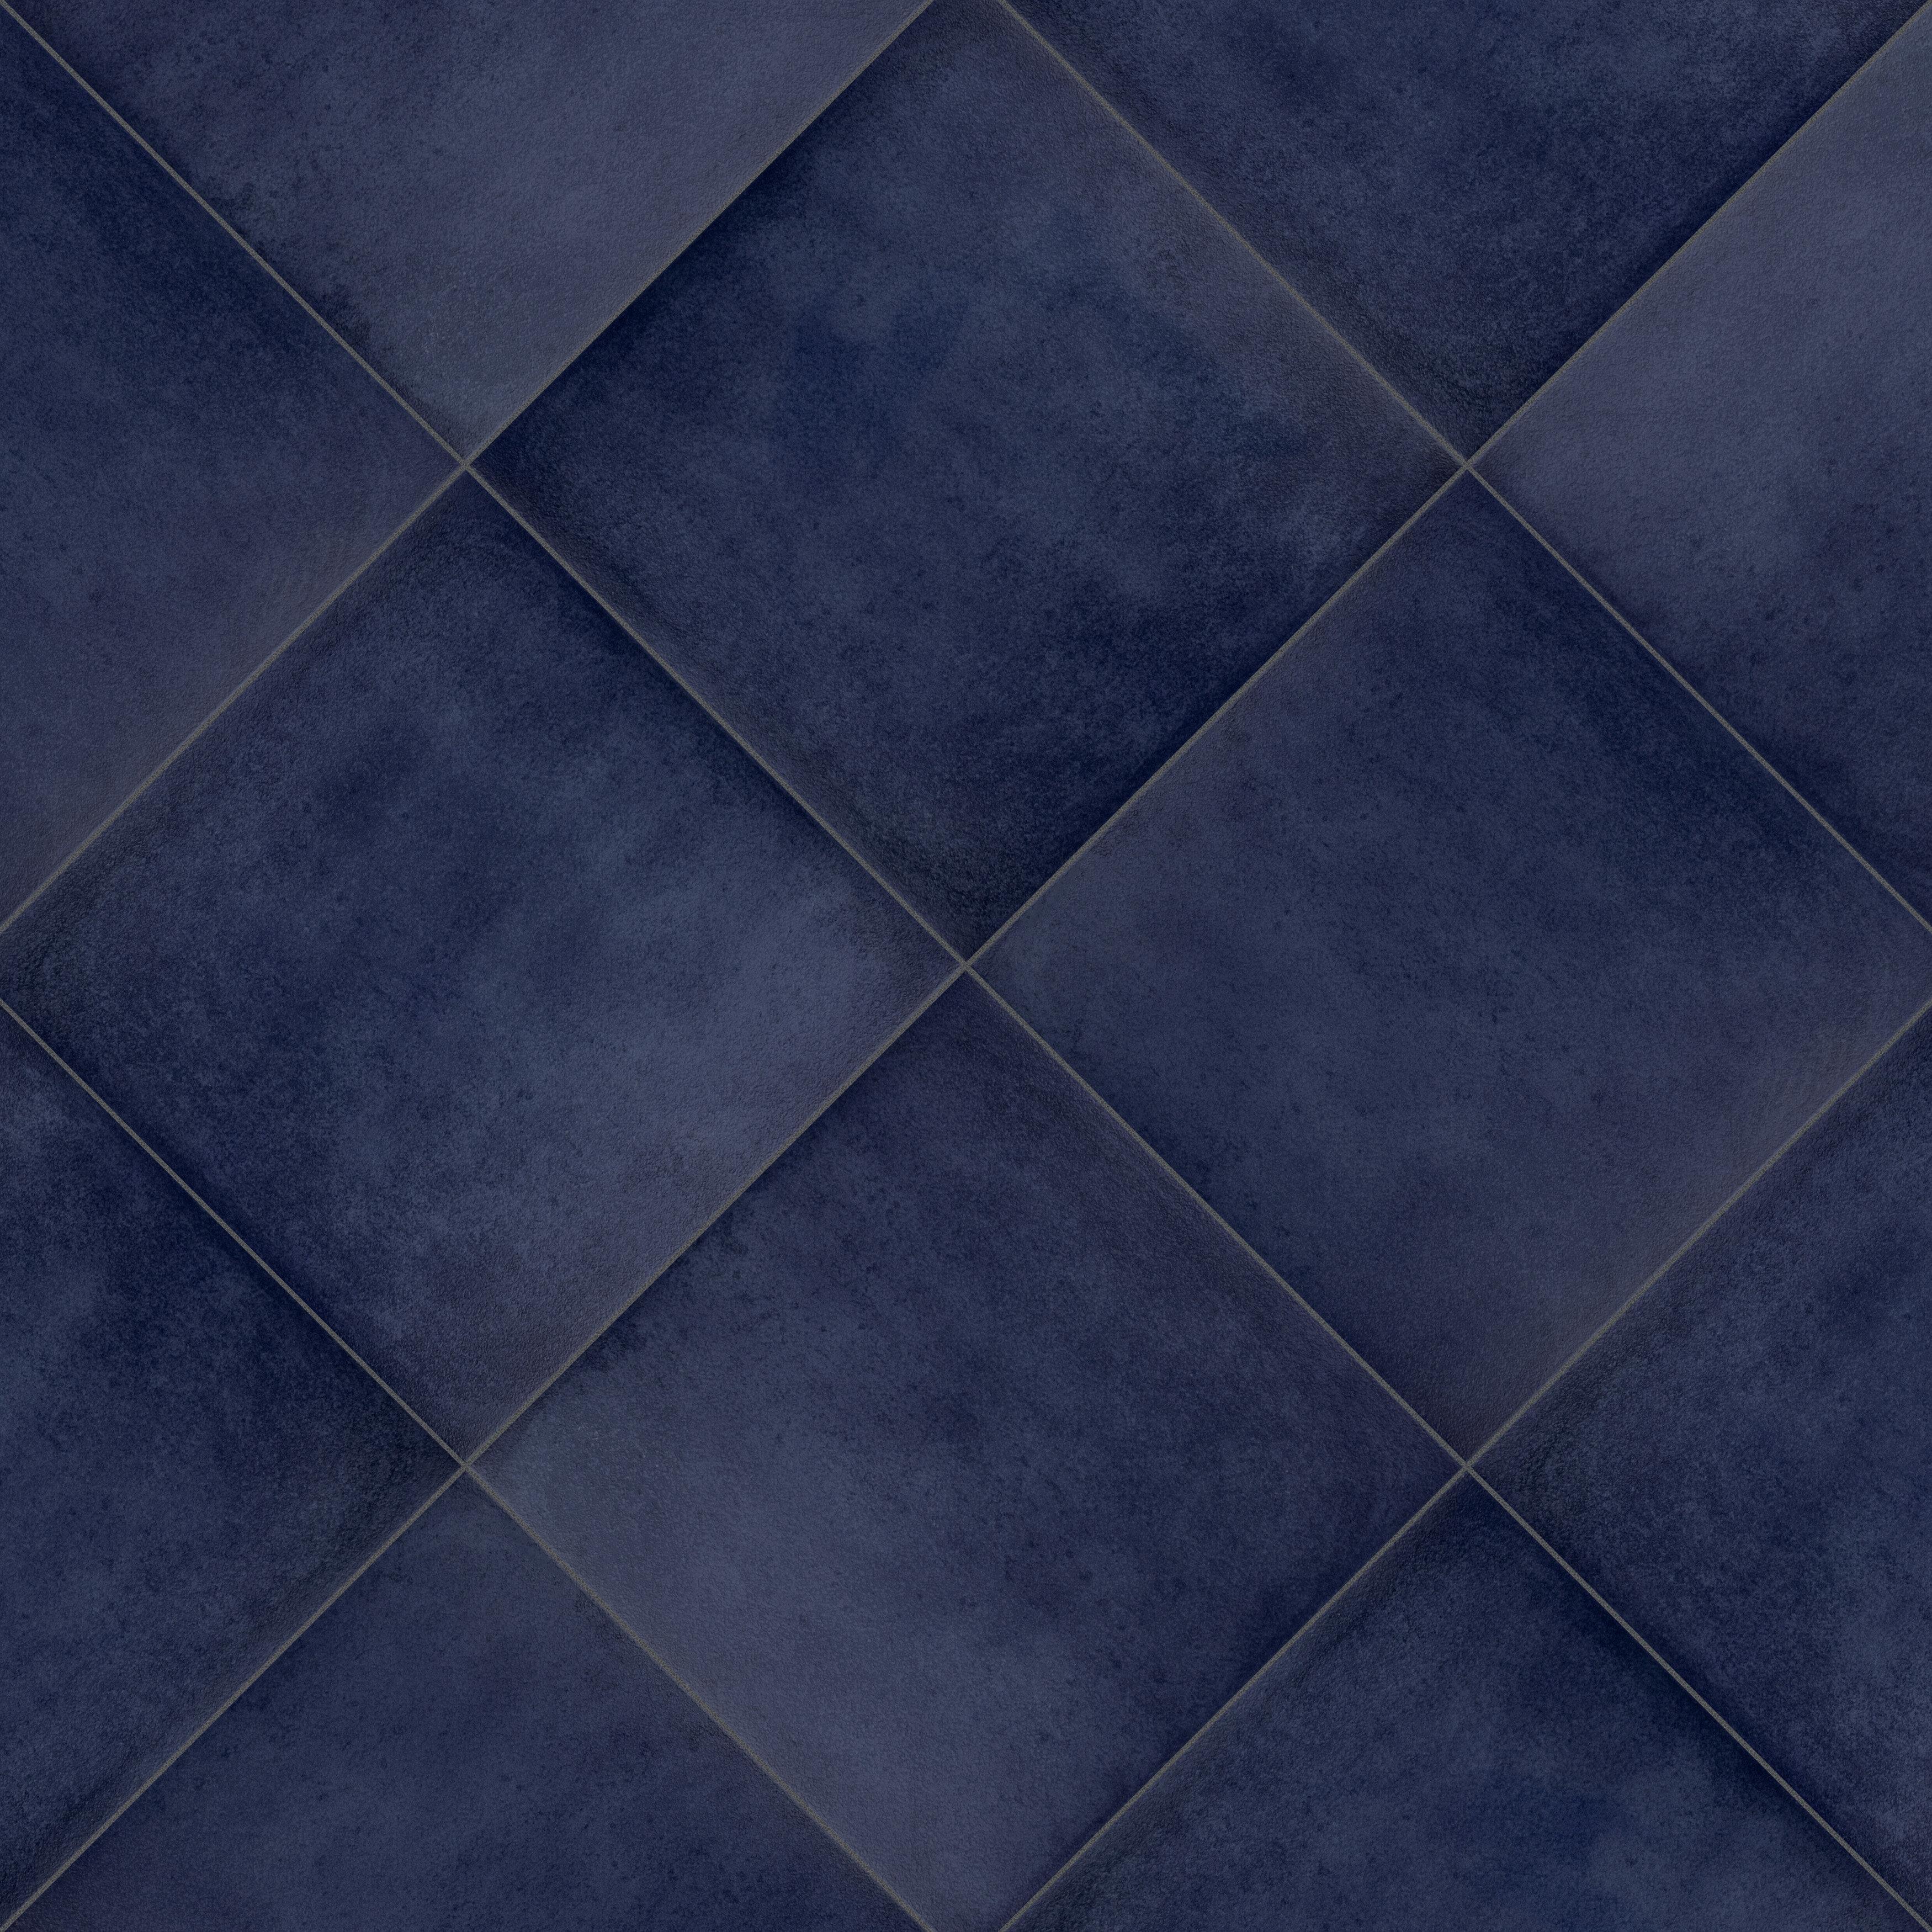 "Symbals 7"" x 7"" Porcelain Wall & Floor Tile"